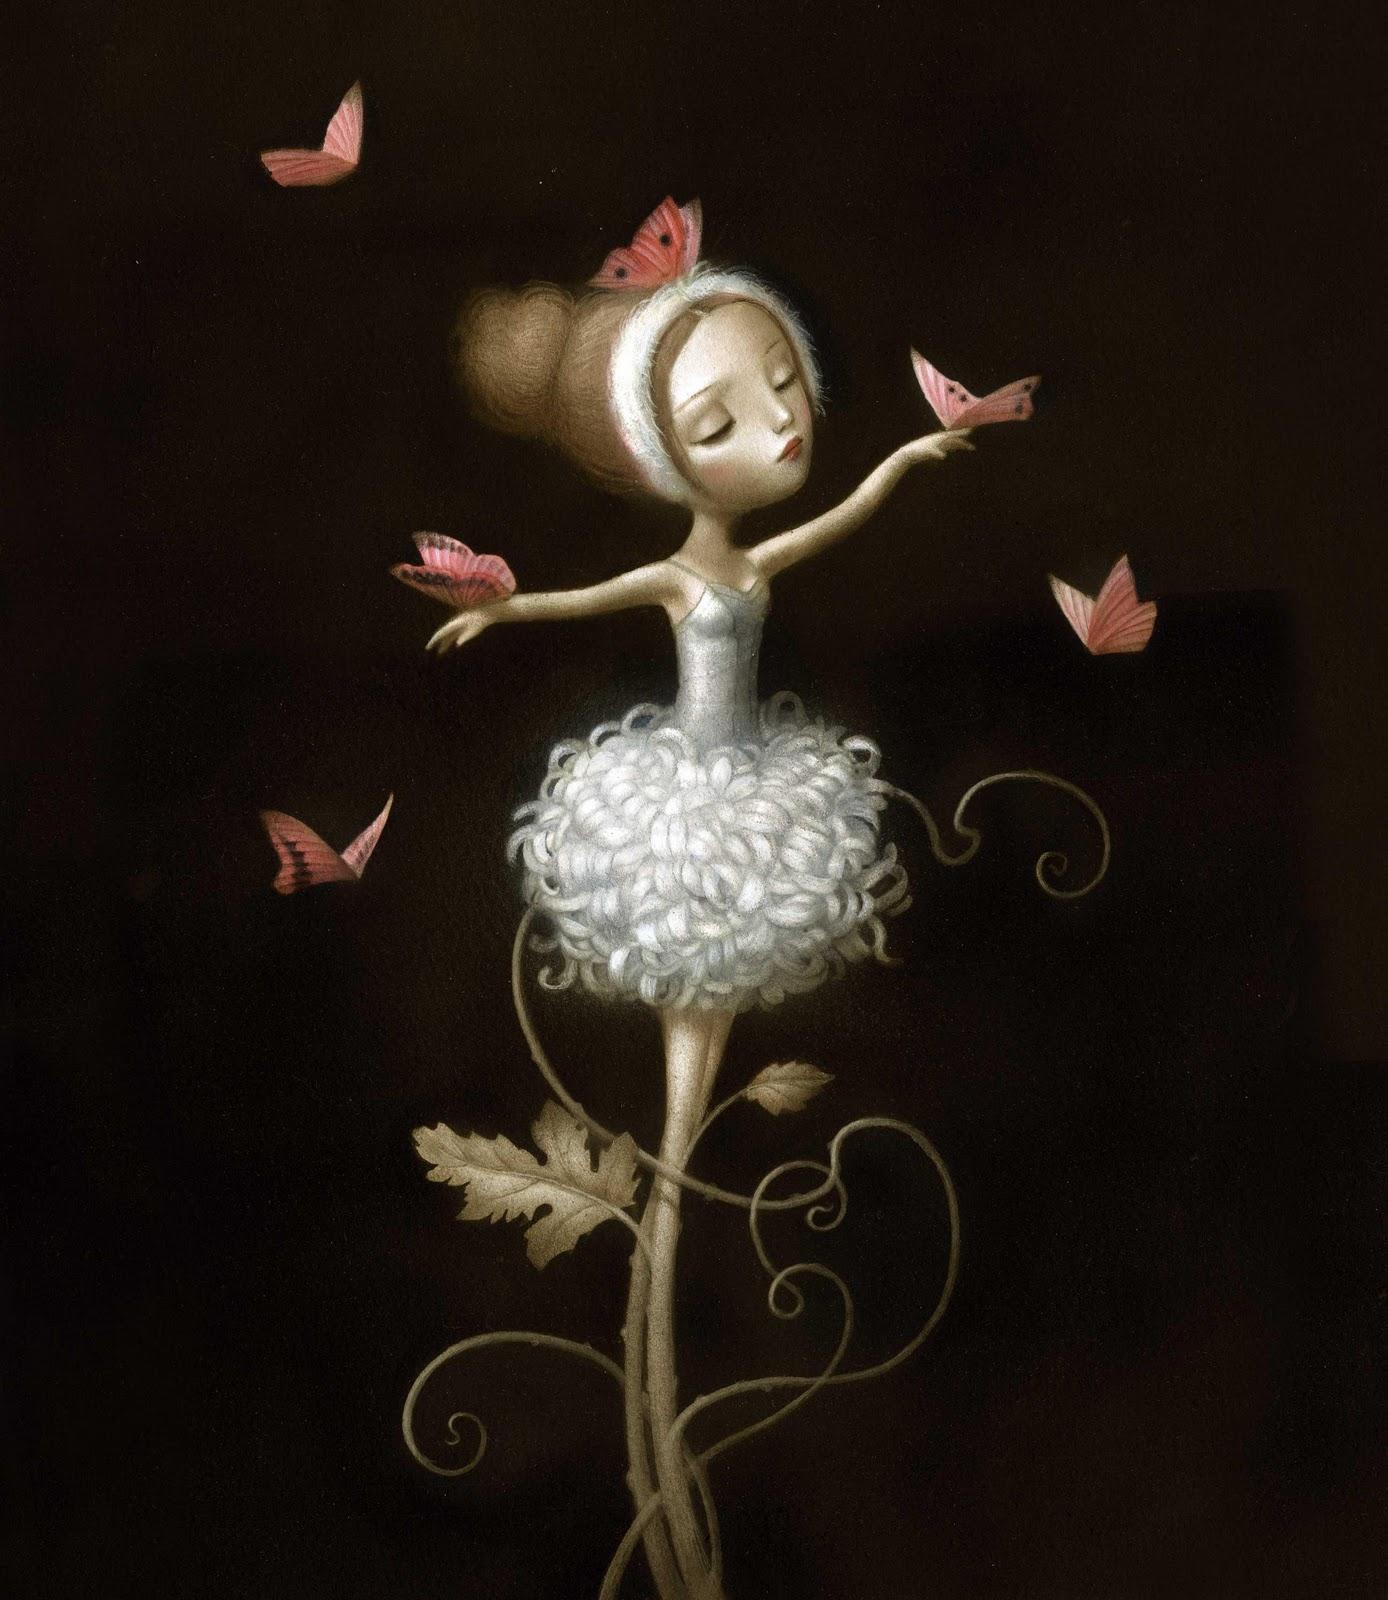 http://1.bp.blogspot.com/-Z7EAzCbla74/TWCKhehRSCI/AAAAAAAAAeI/Kr11mnET98w/s1600/illustration-nicoletta-ceccoli-beaute-cauchem-L-0CqODe.jpg